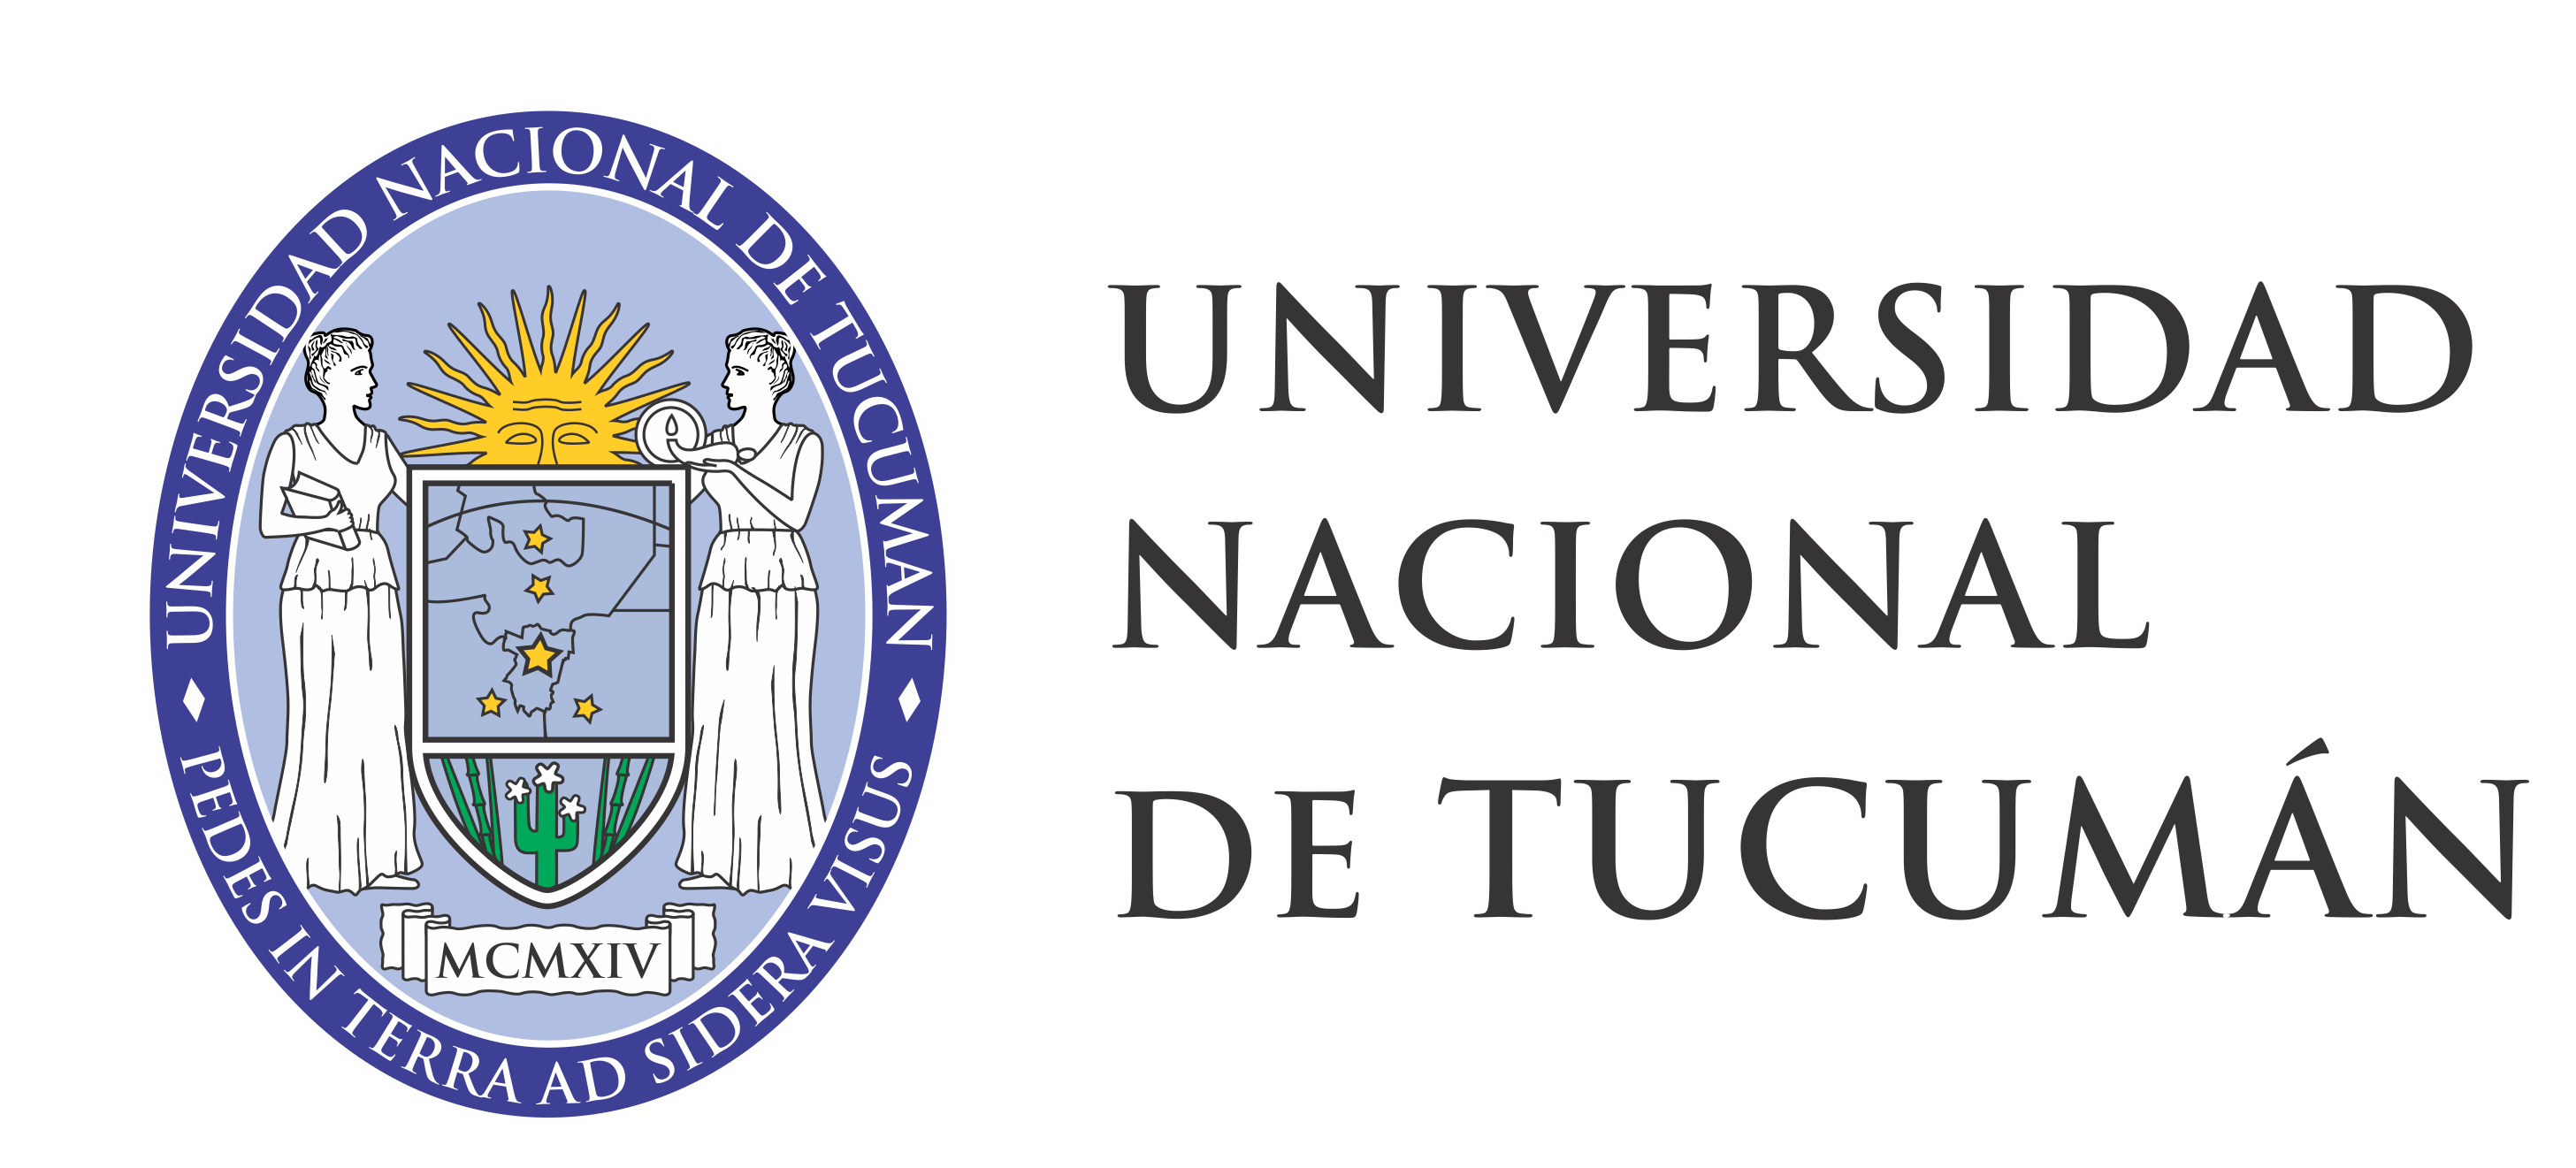 universidad-nacional-de-tucuman